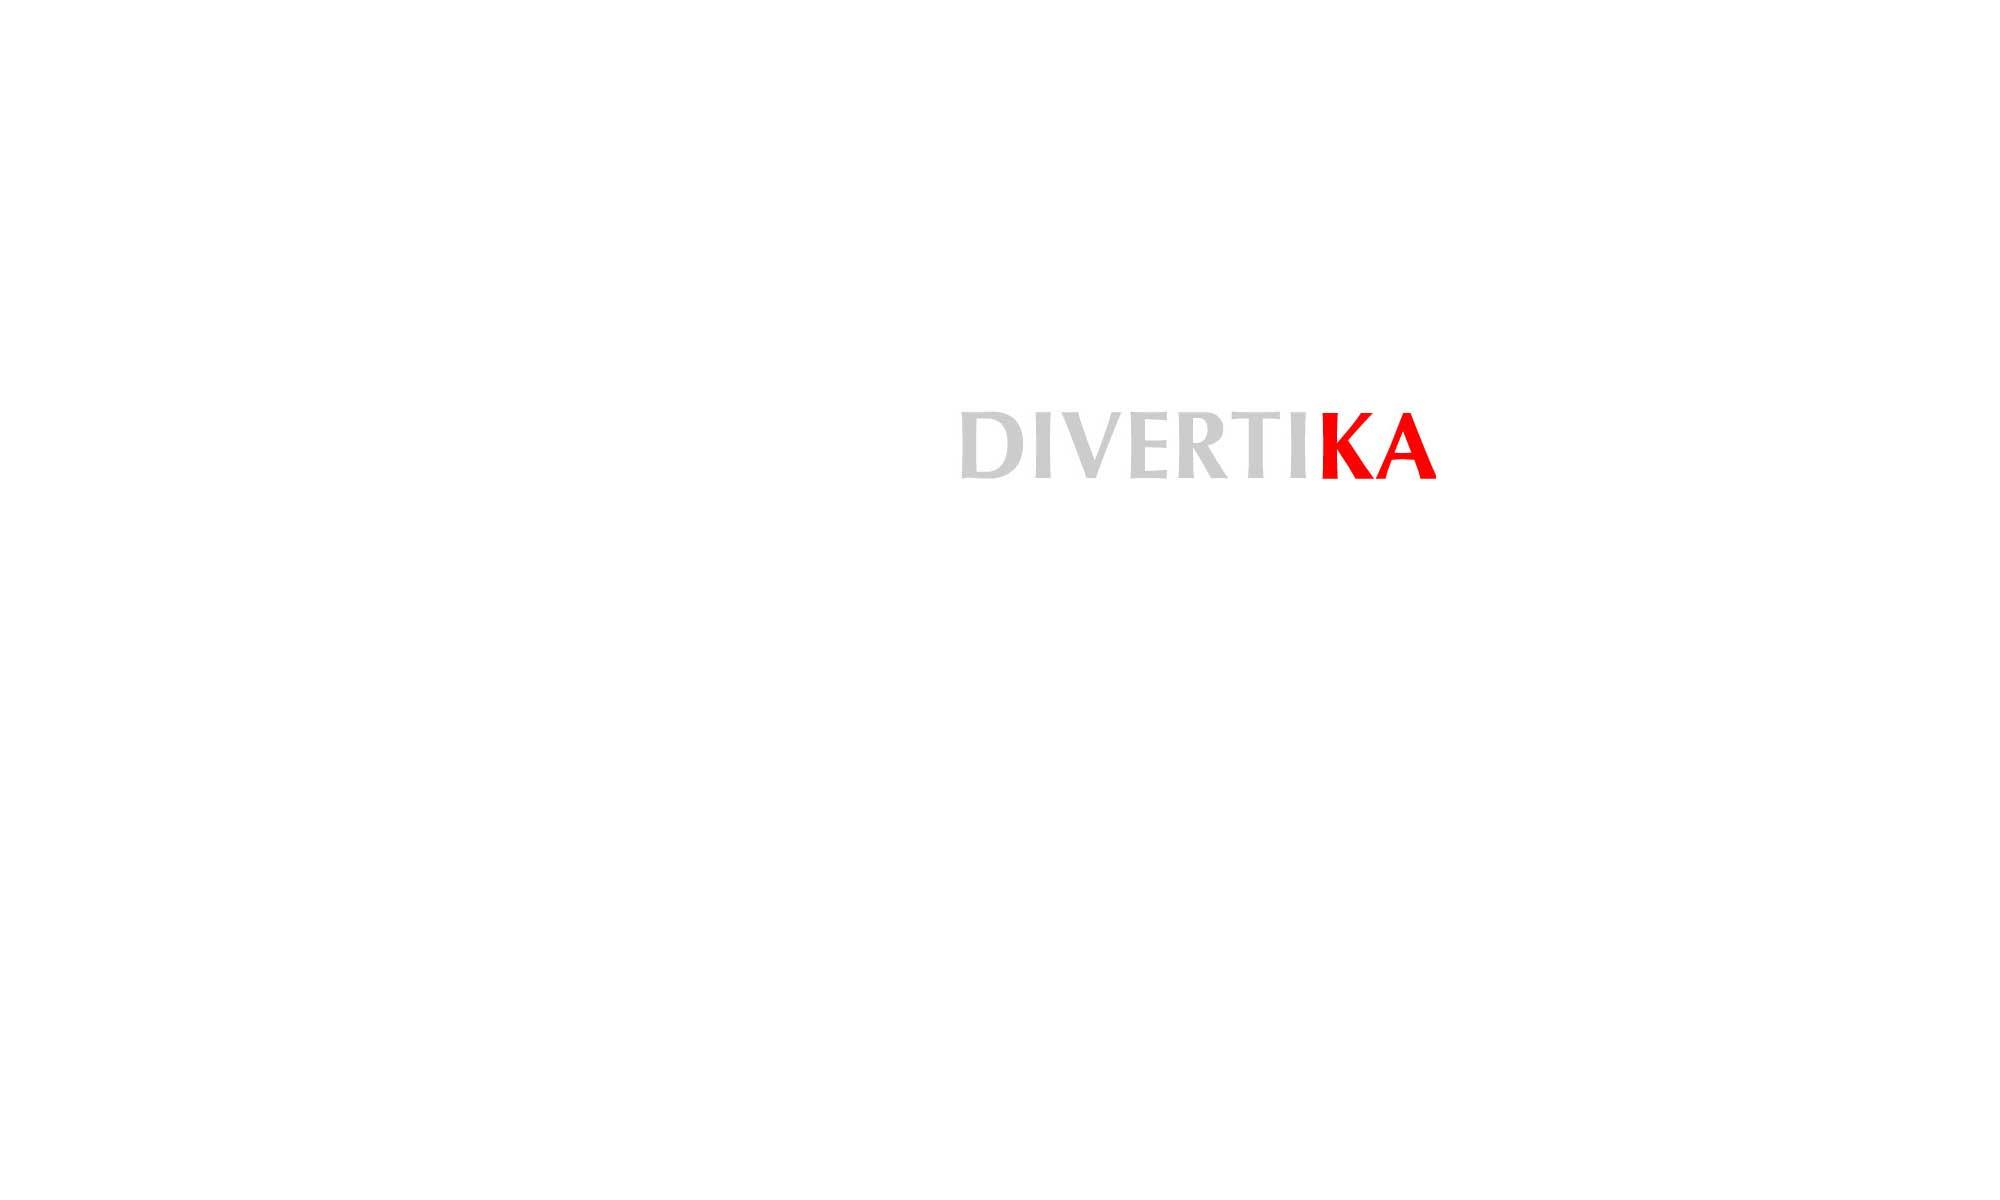 Divertika